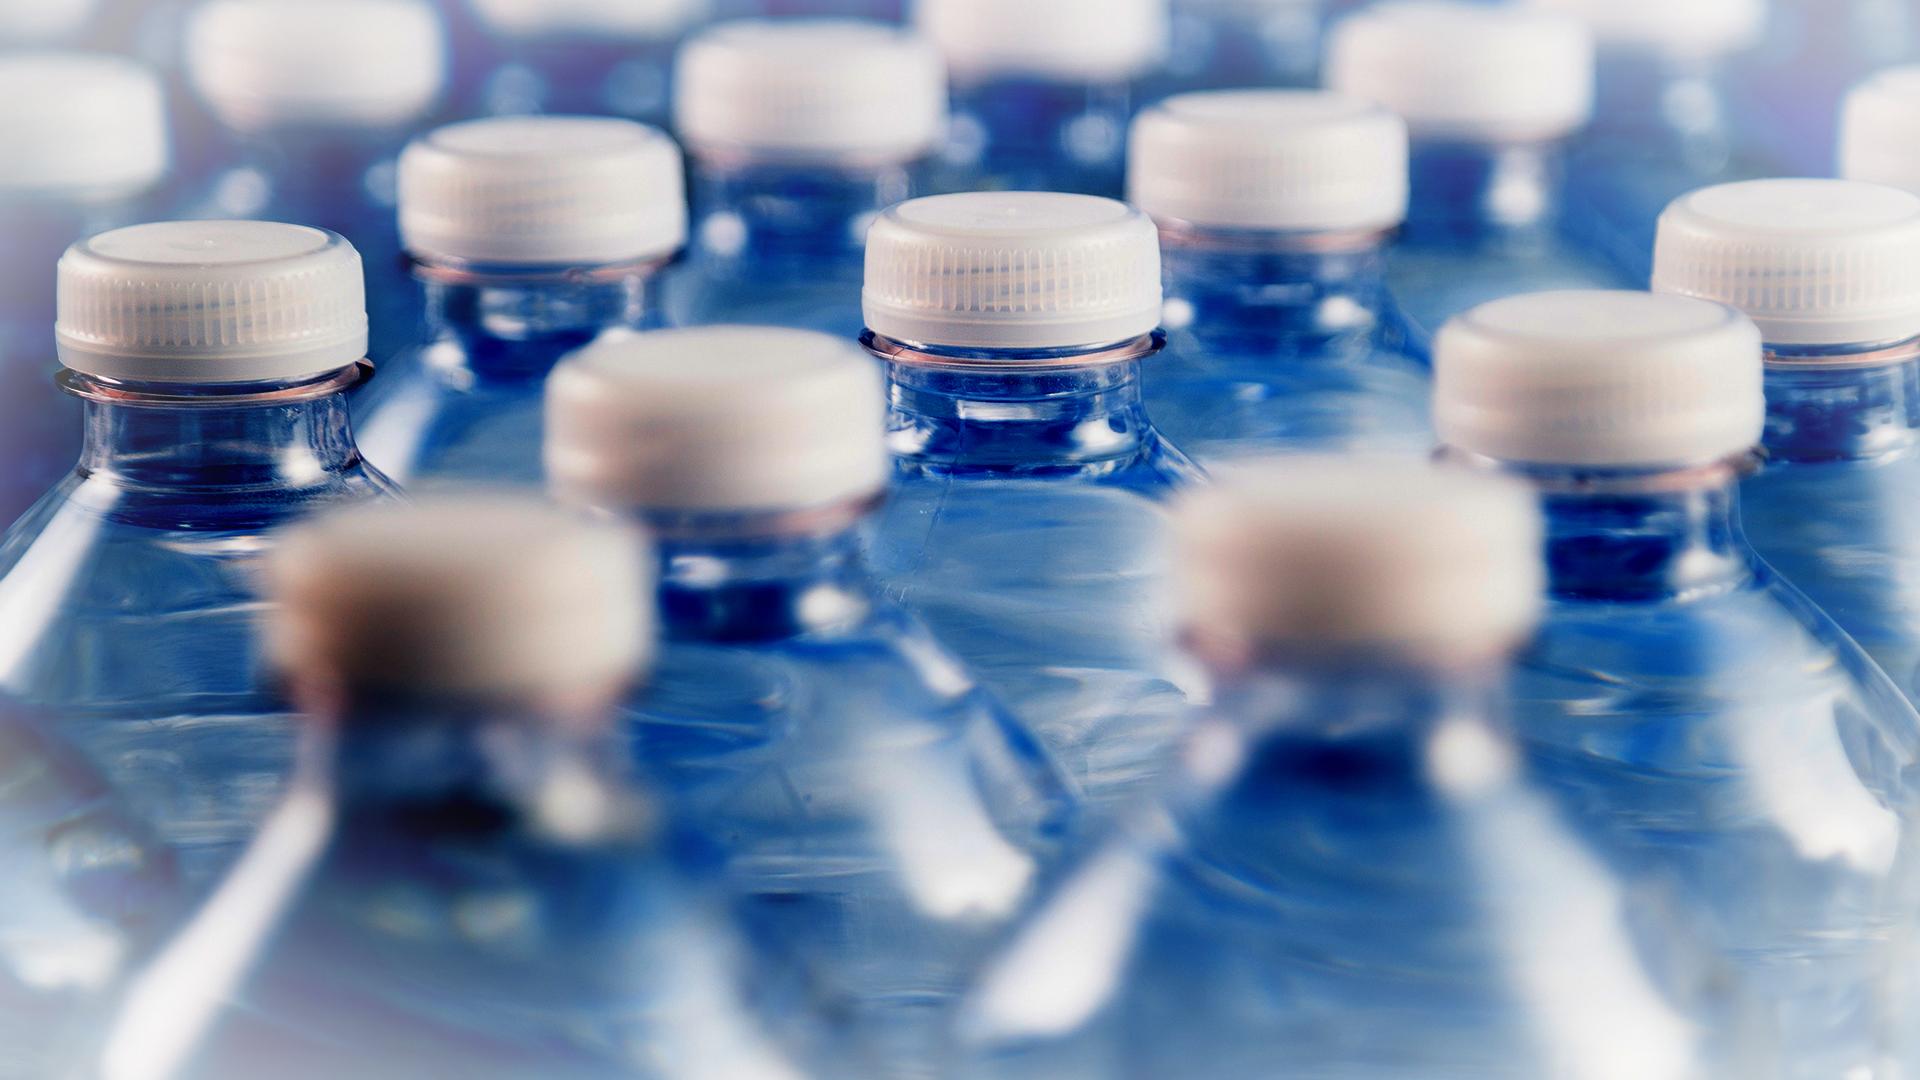 Canada's Kenya chancery, staff need 200 plastic water bottles every week